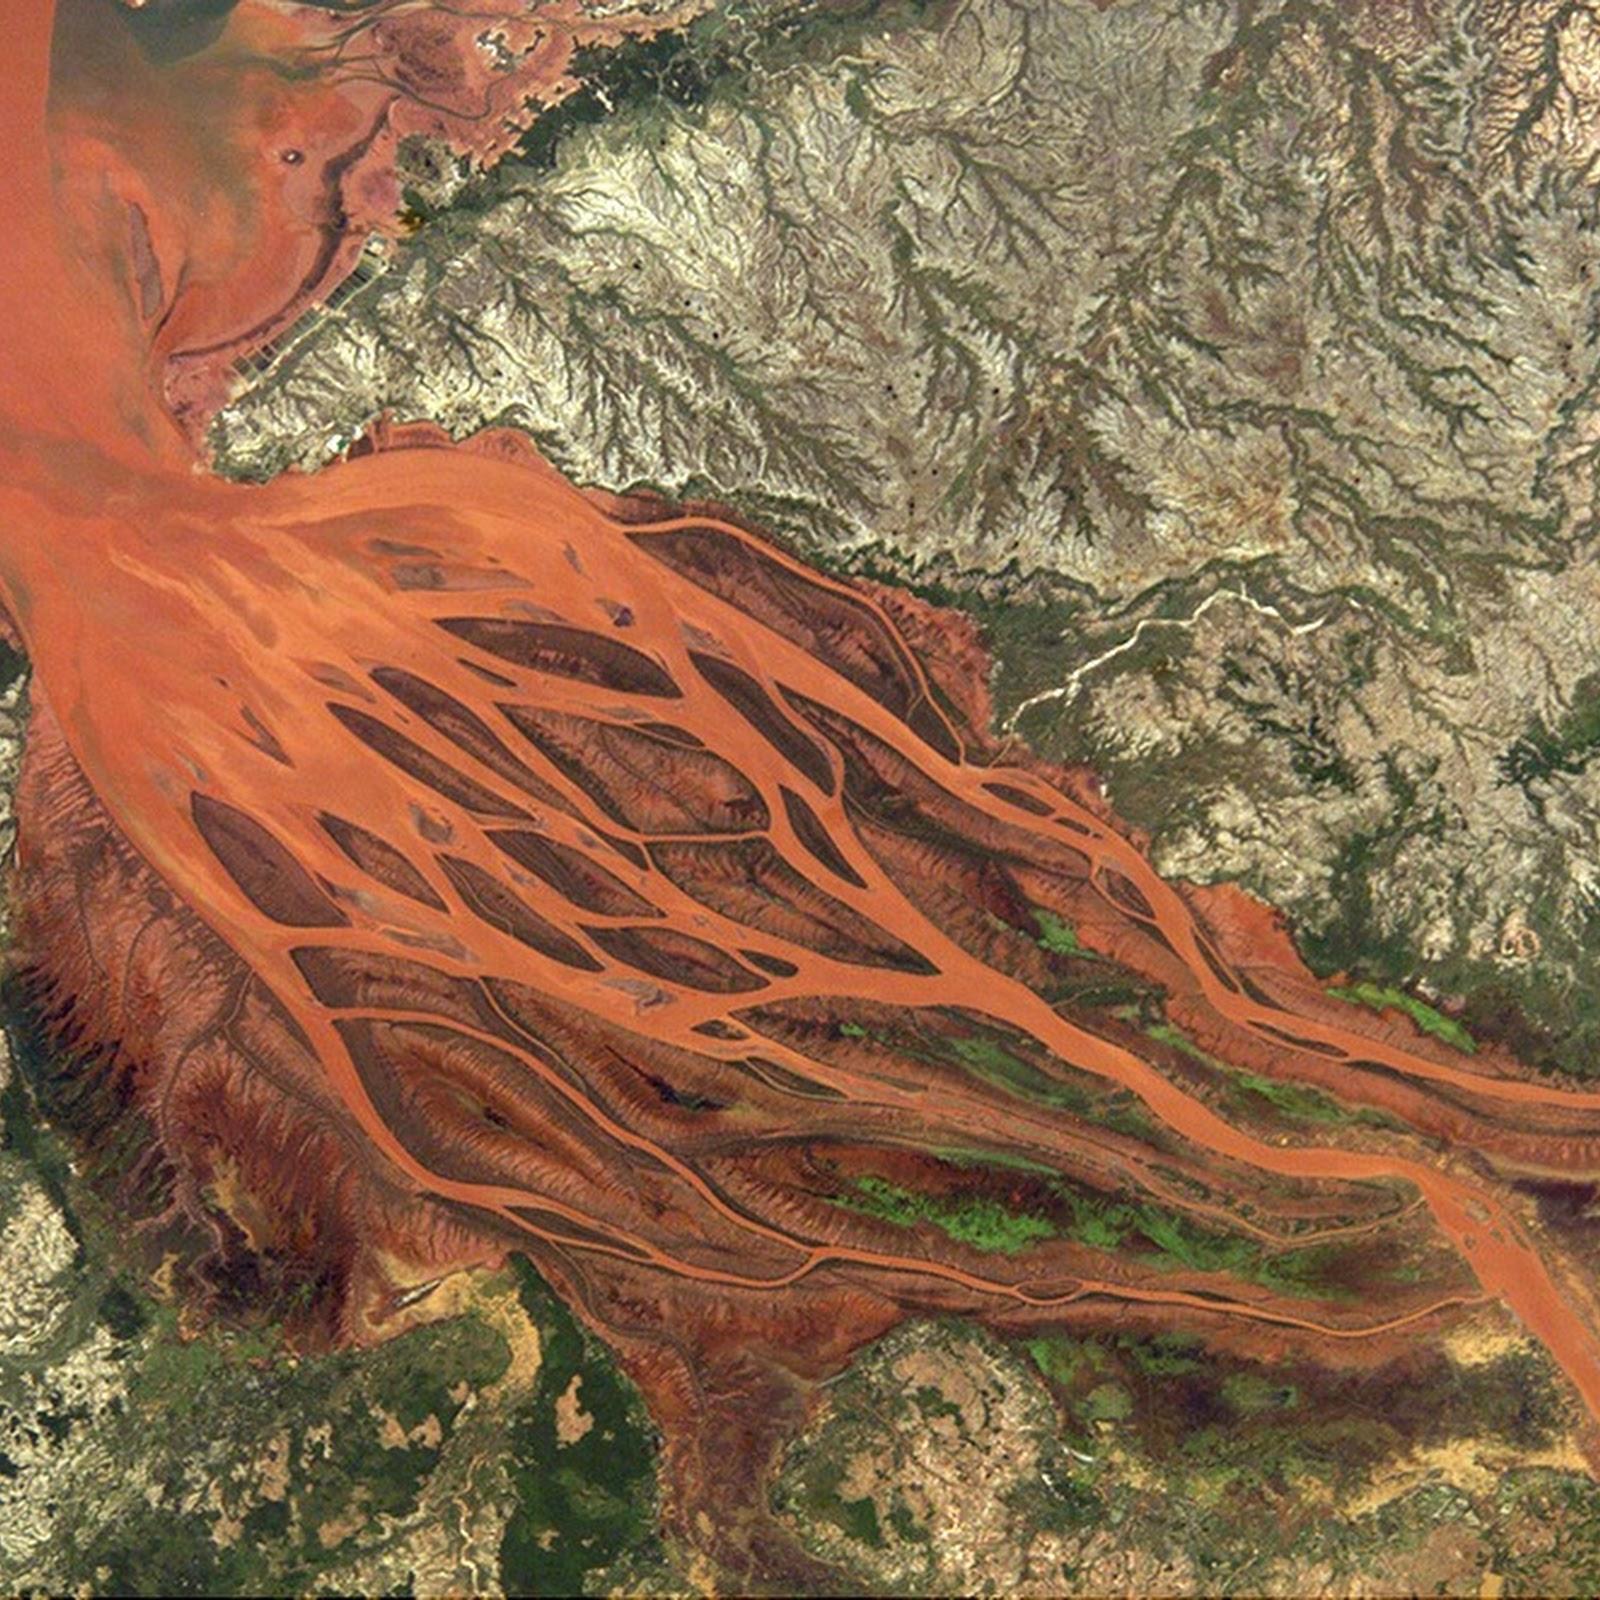 Betsiboka: Madagascar's Red River